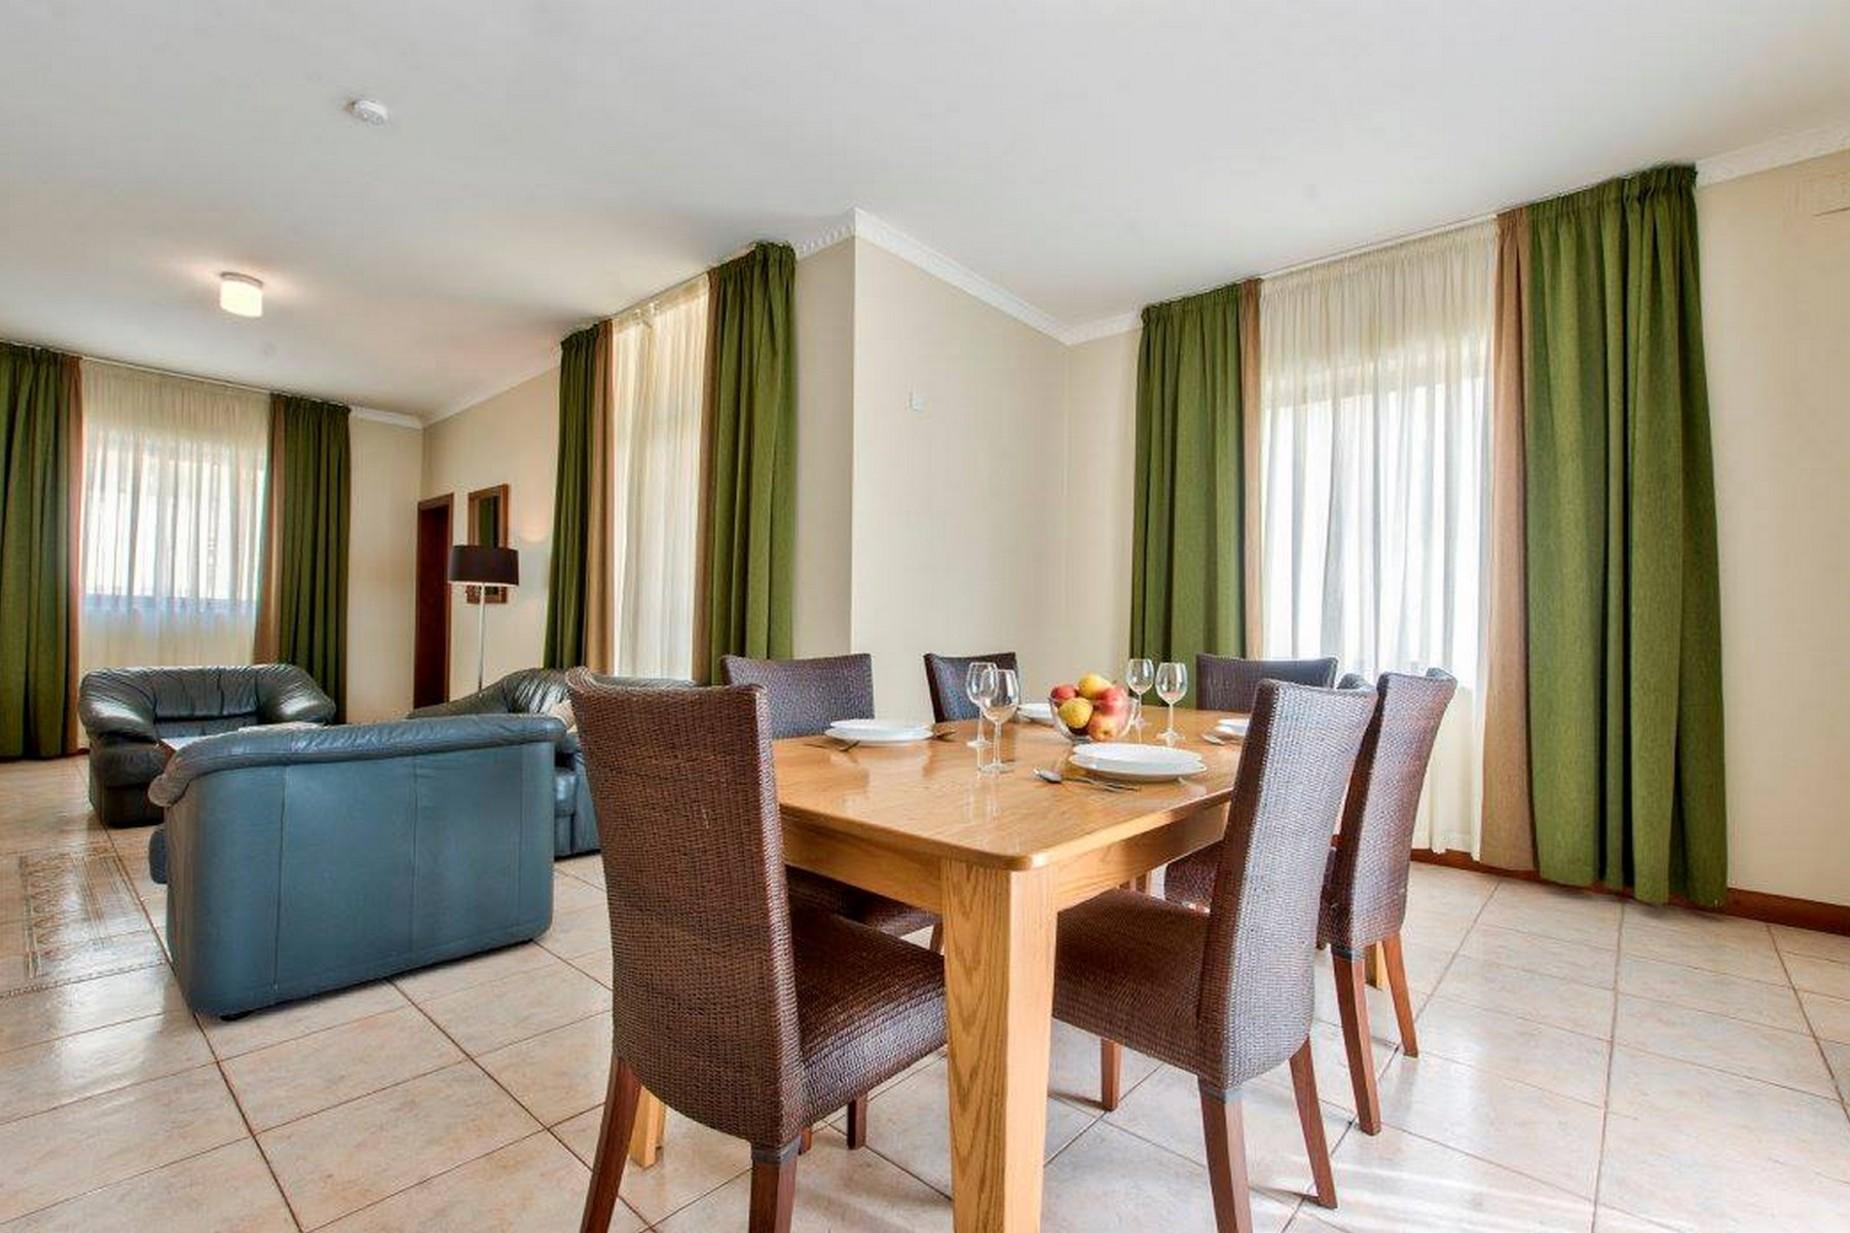 3 bed Villa For Rent in Mellieha, Mellieha - thumb 4